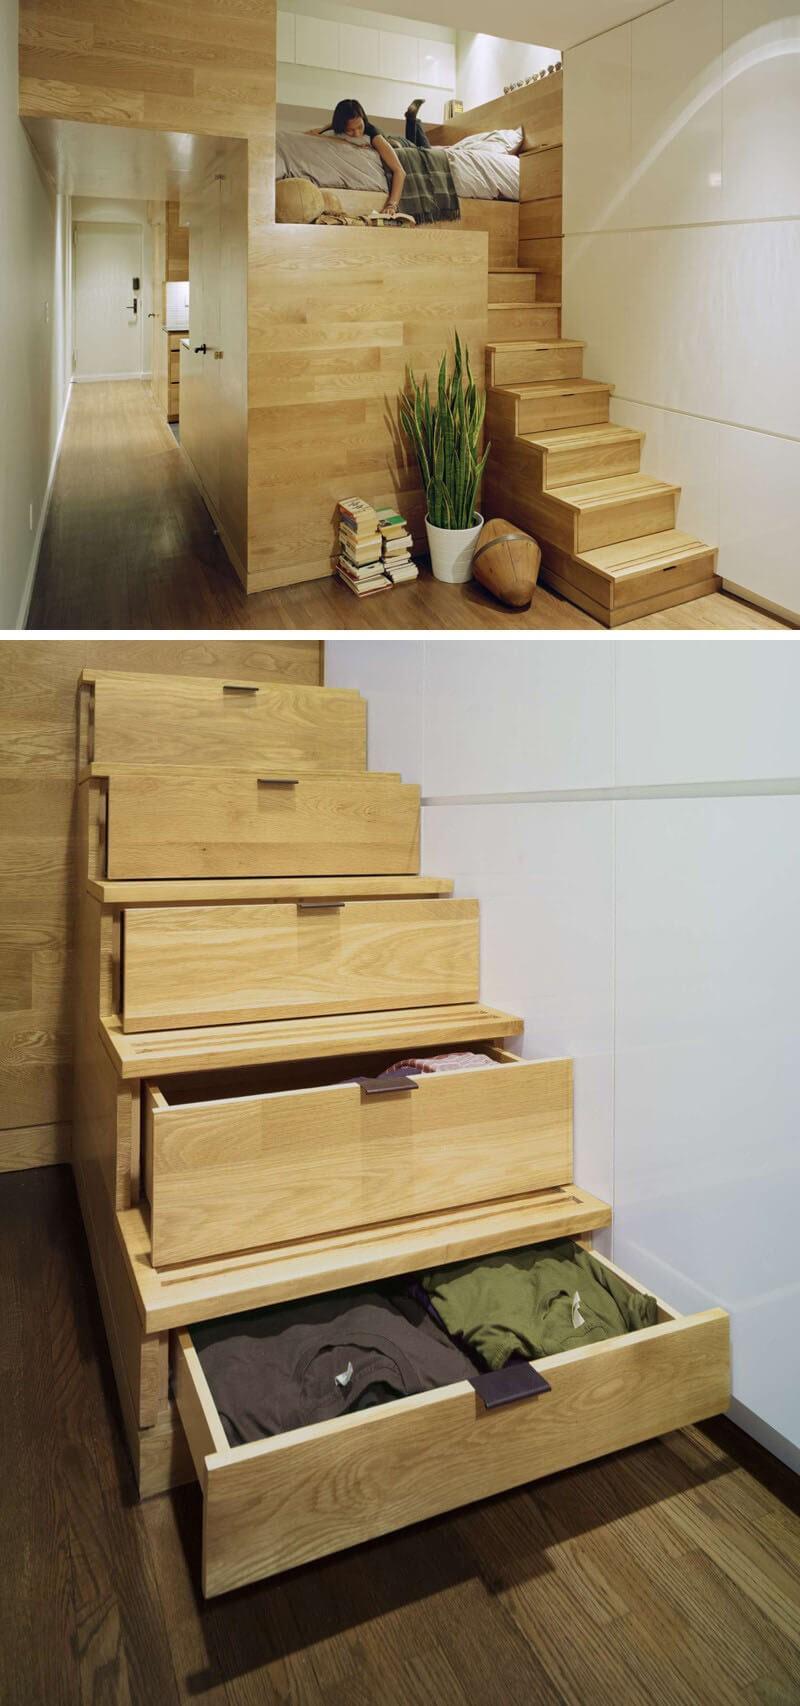 9 Genuine Staircase Storage Idea via simphome